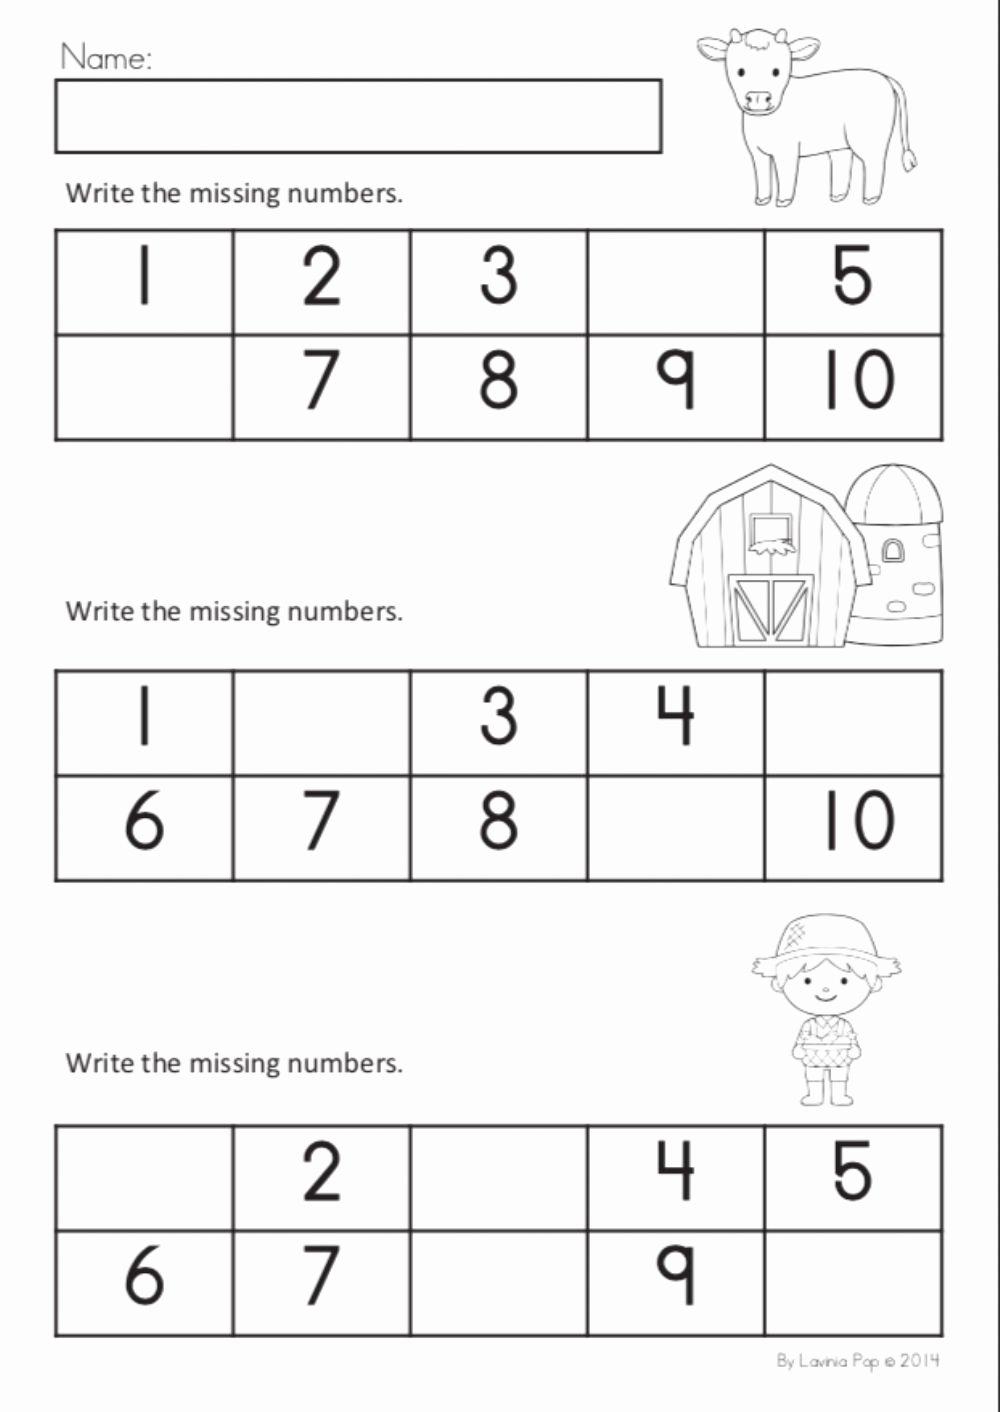 Missing Number Worksheets 1 10 Best Of Missing Numbers 1 10 Interactive Worksheet